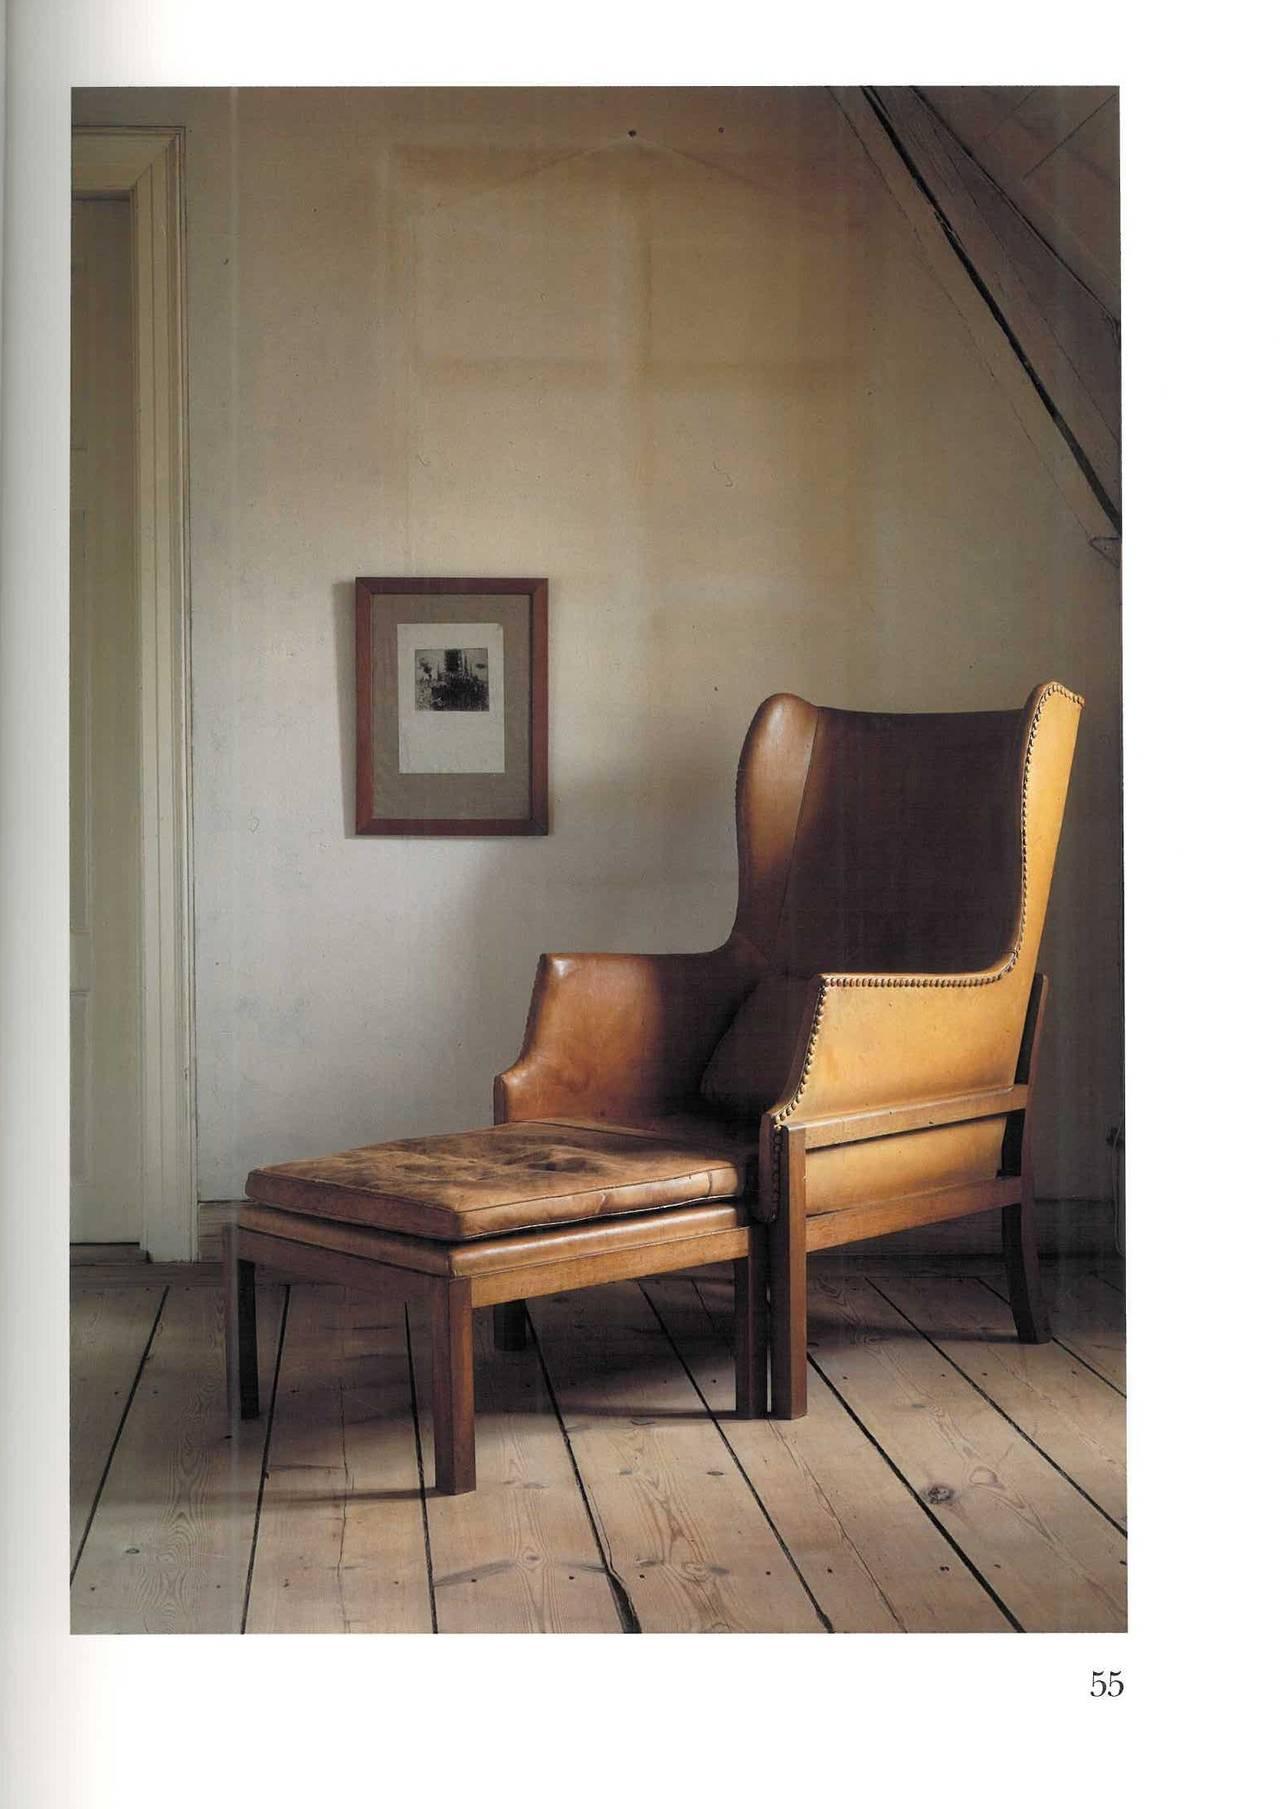 Danish Furniture Design In The 20th Century Two Volume Book 2